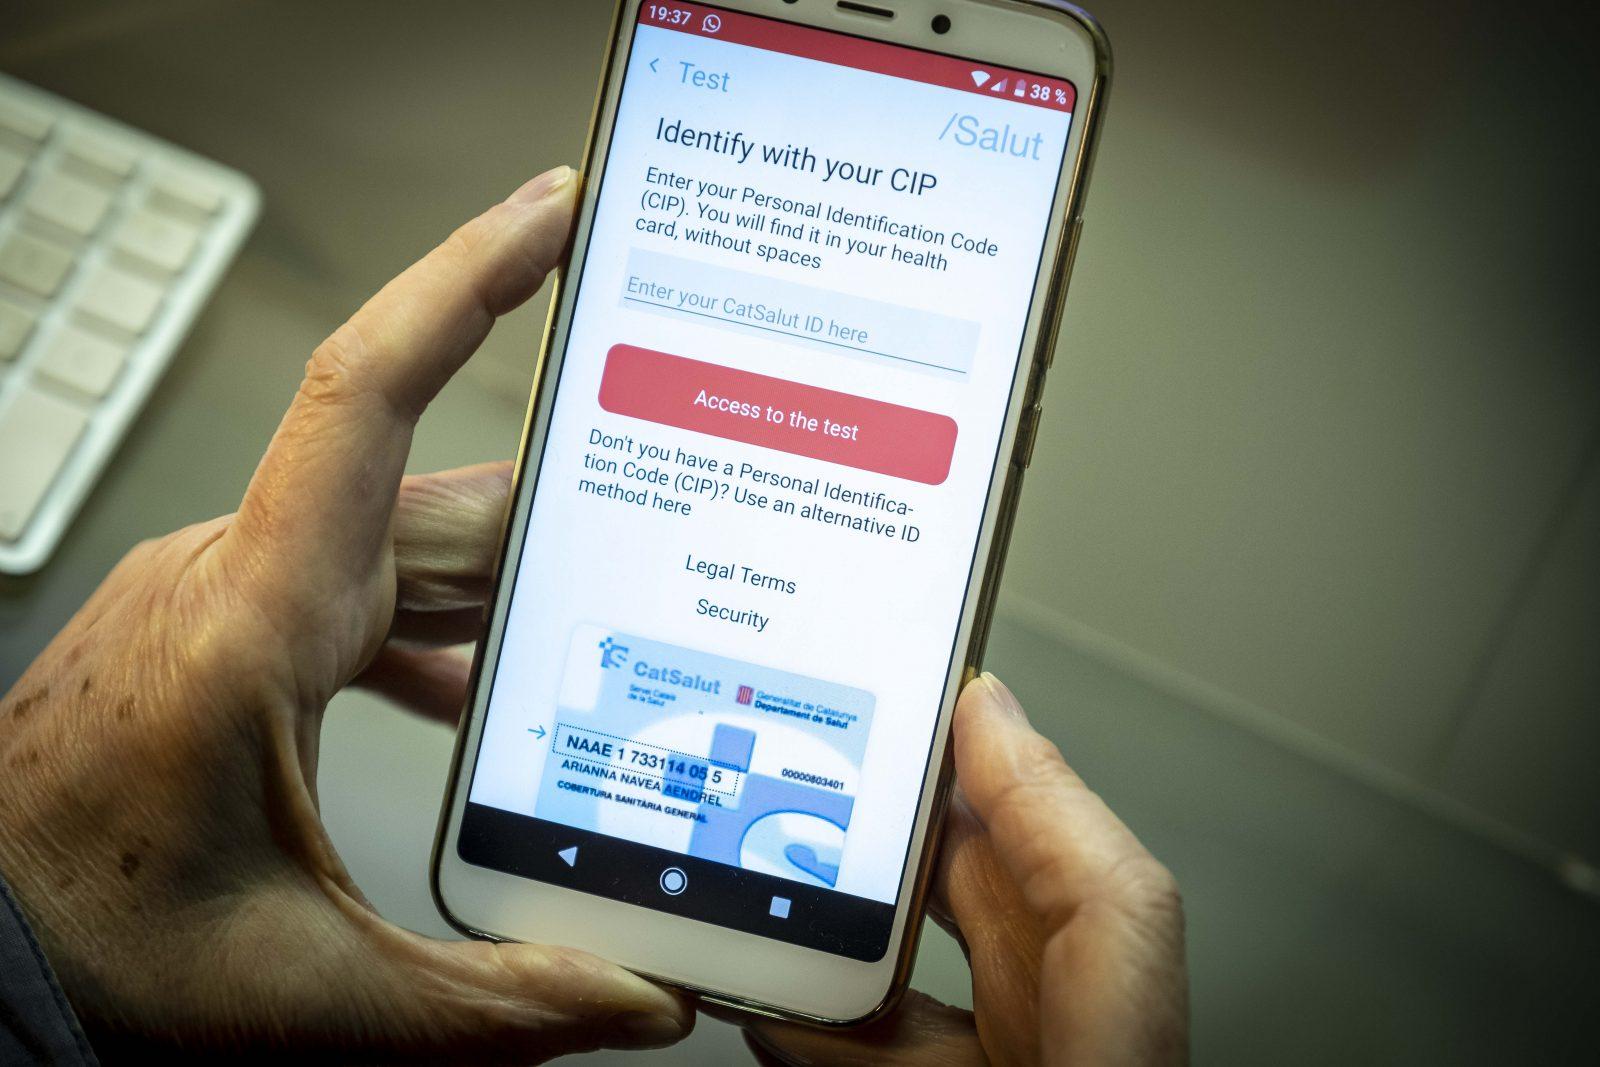 Smpartphone-App gegen Corona-Ausbreitung